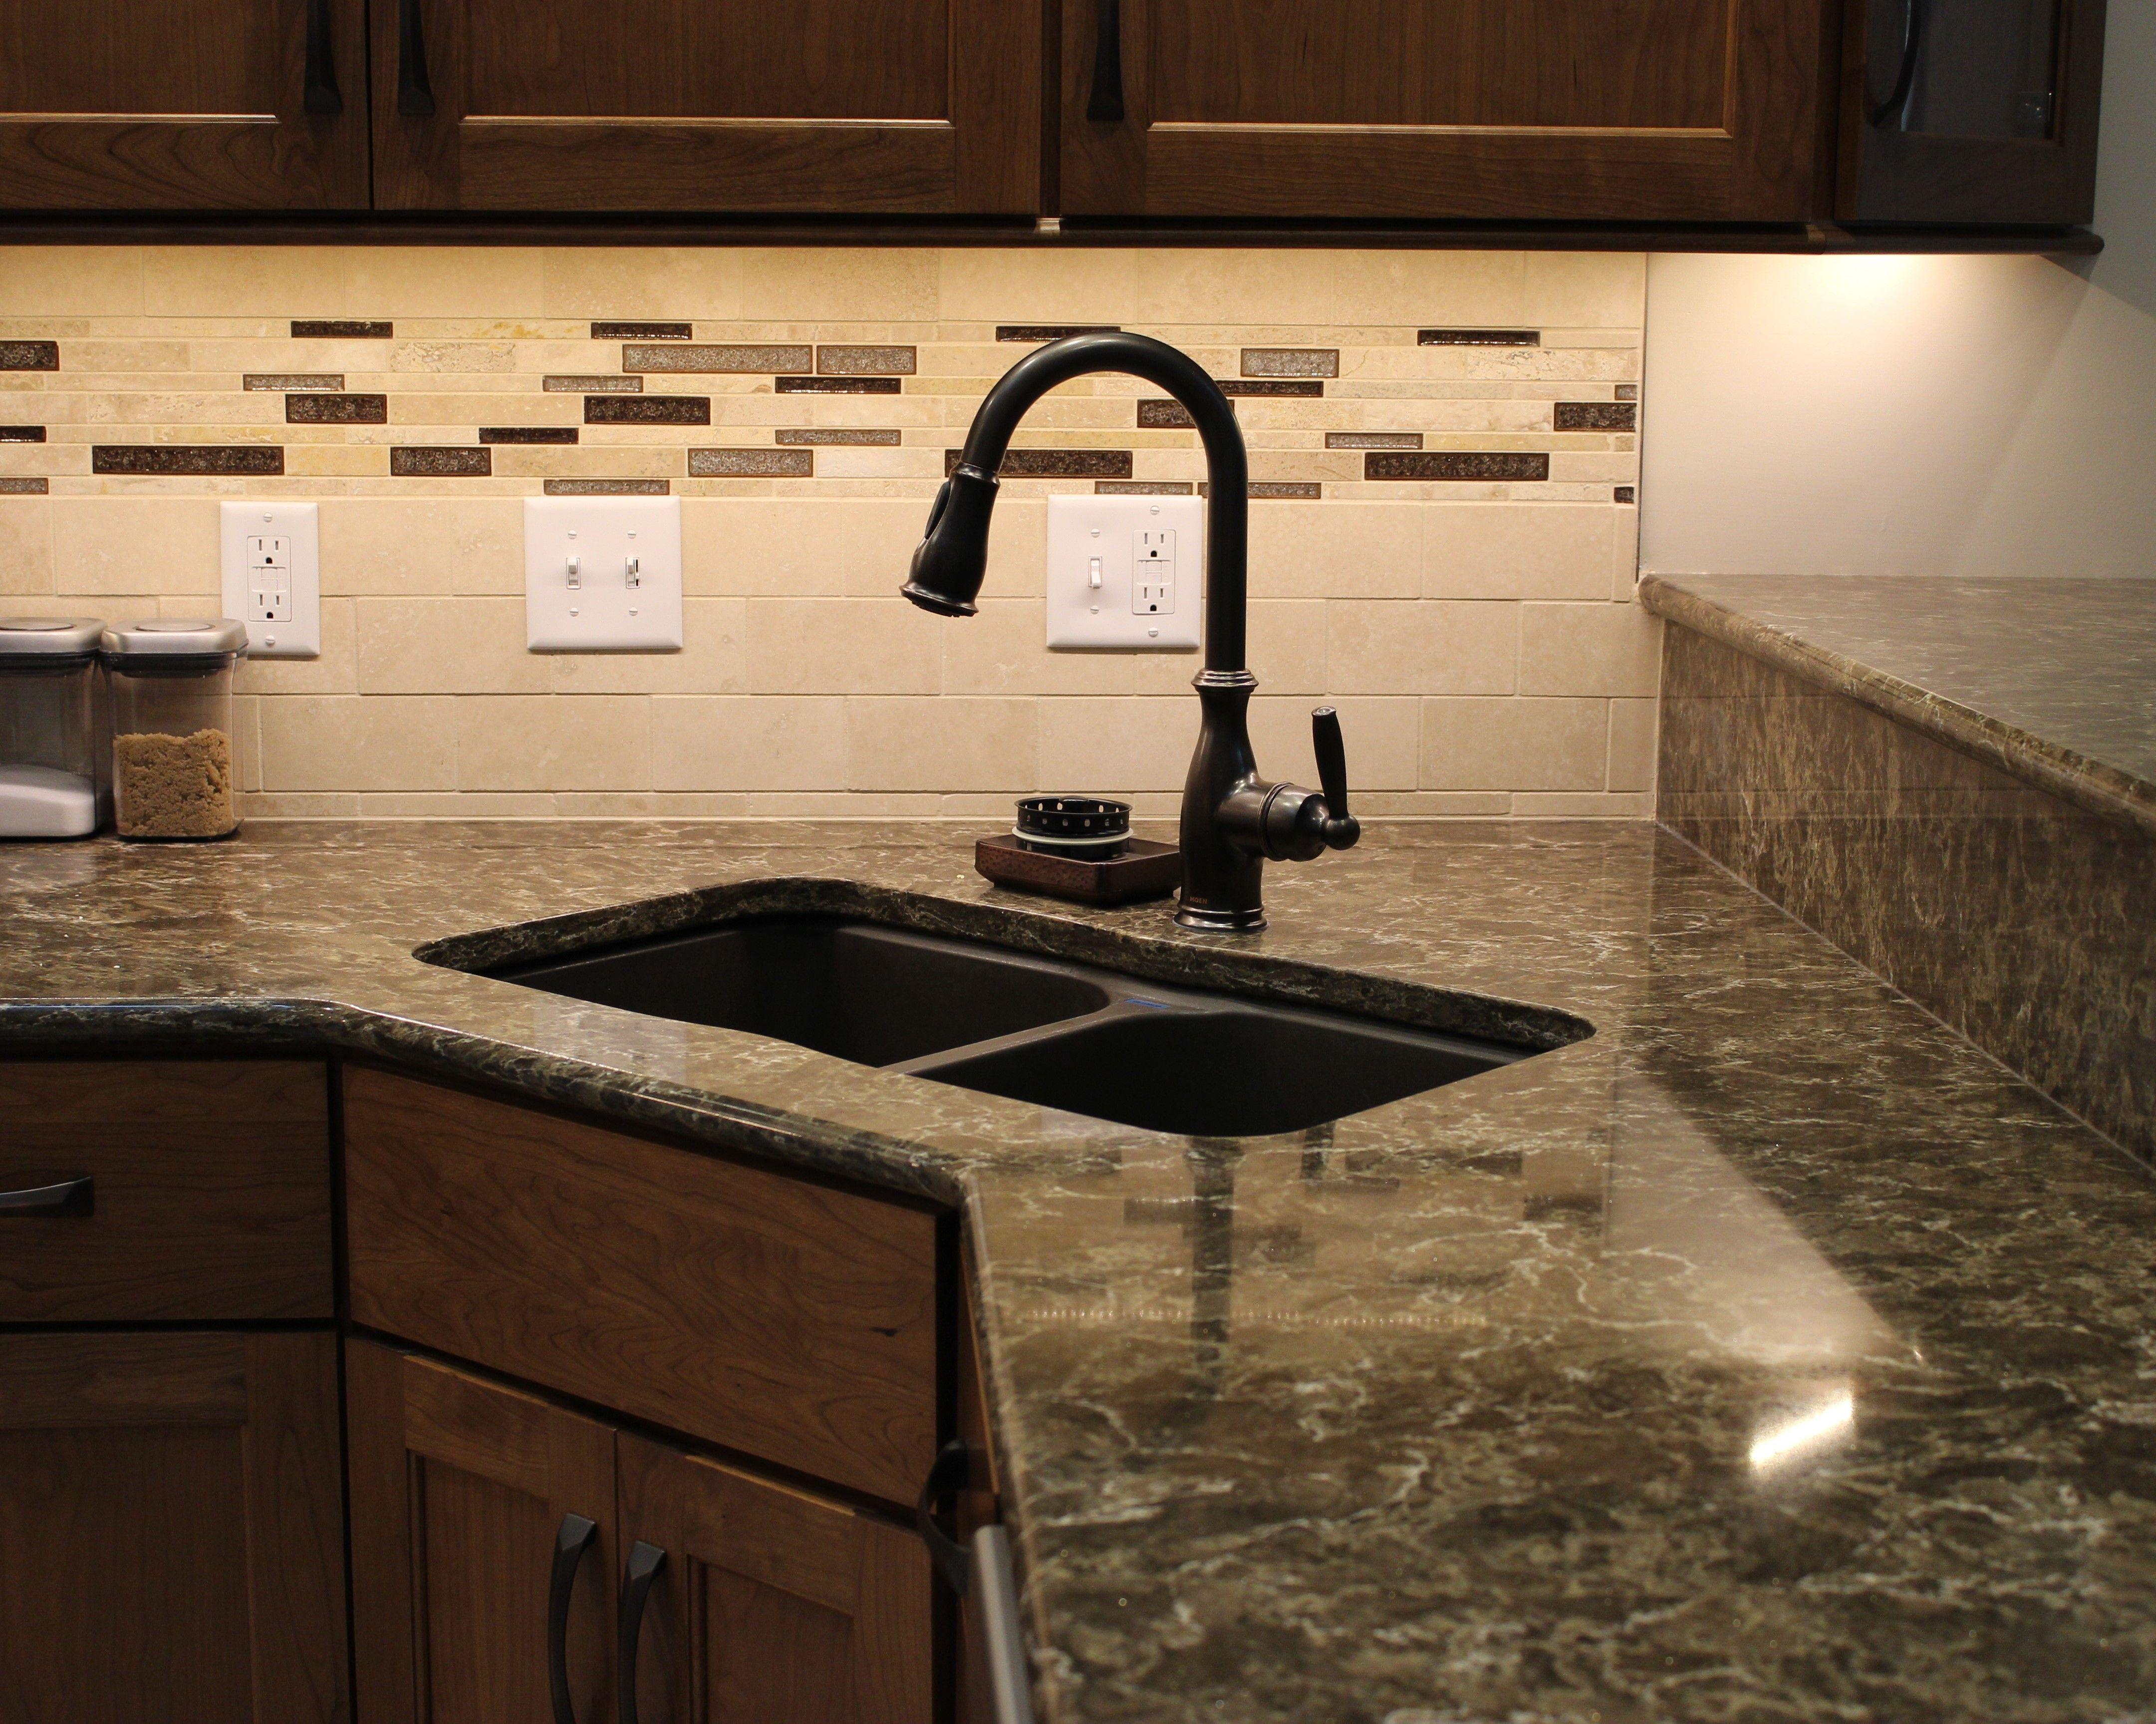 Transitioning A Backsplash Tile Into A Dual Height Peninsula Area Villagehomestores Com Tile Backsplash Custom Benches Tiles